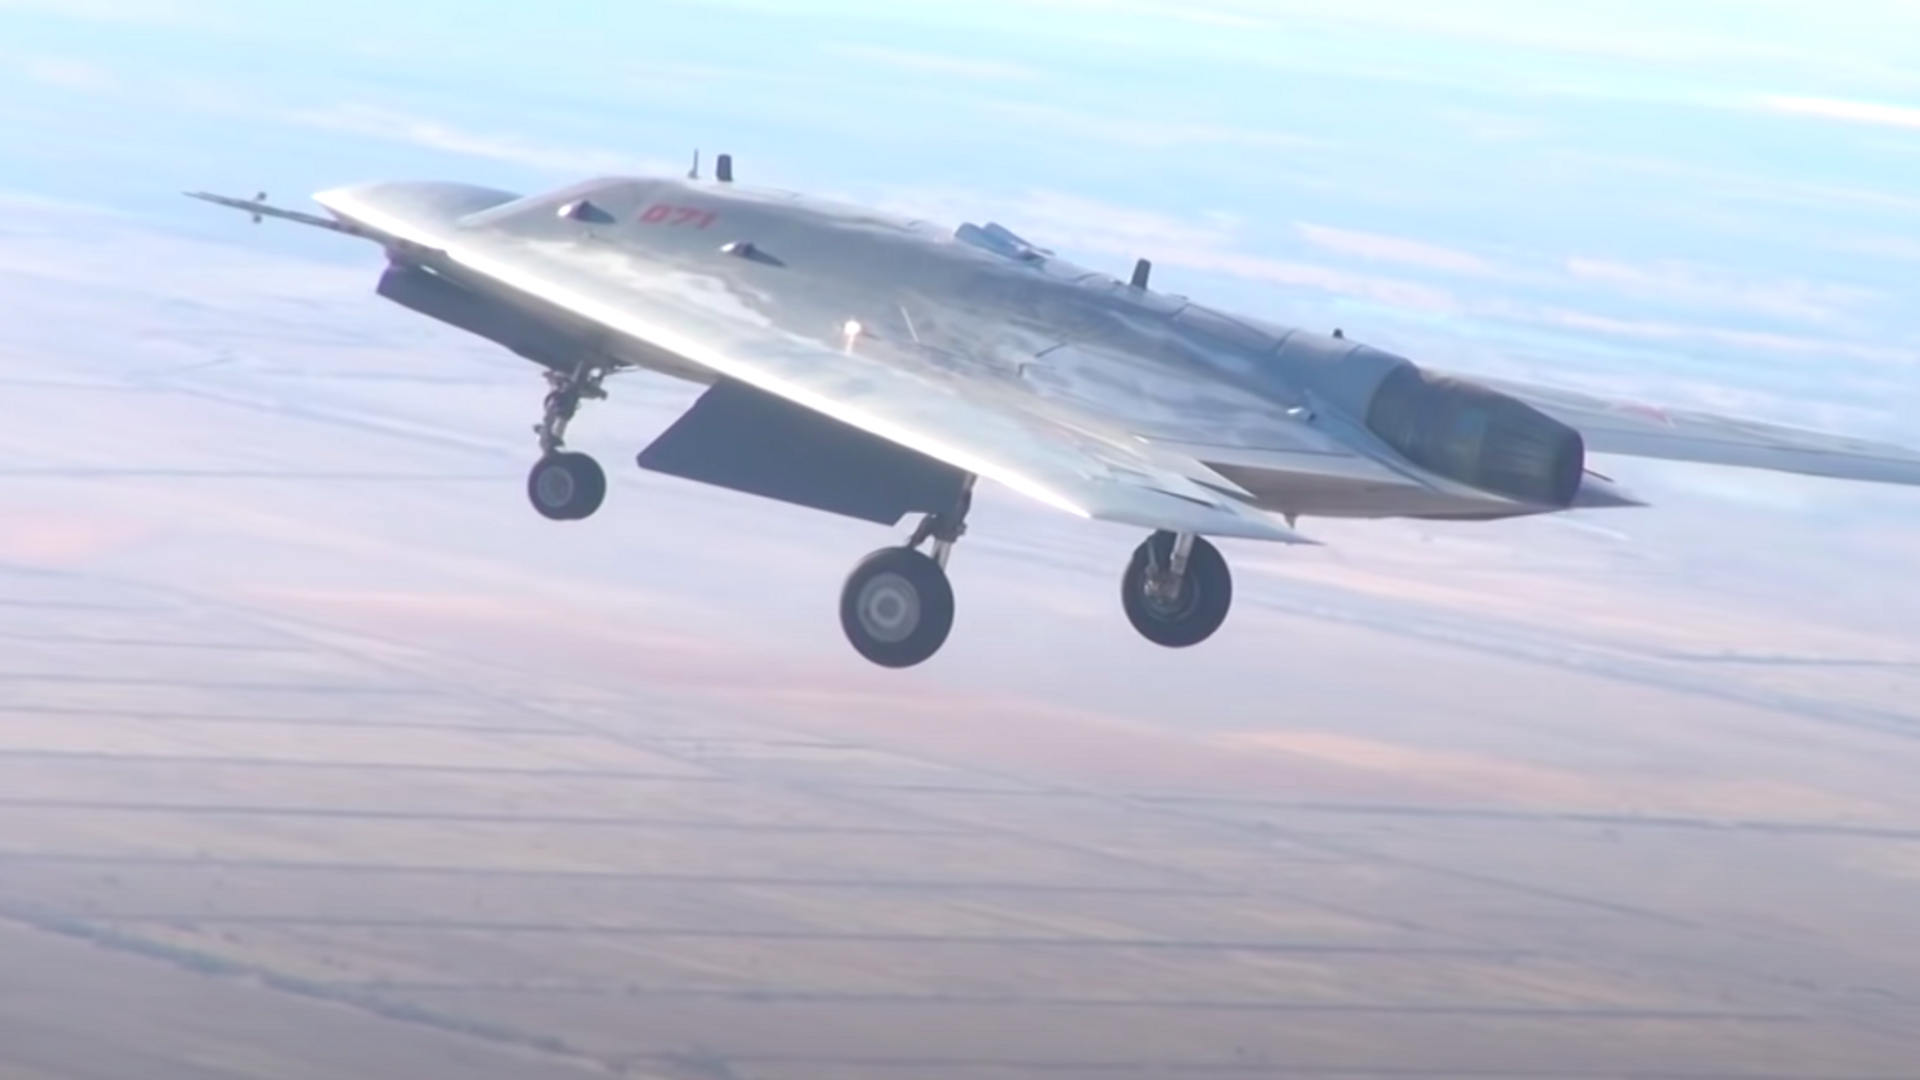 El dron militar ruso Ojotnik durante unas pruebas - Sputnik Mundo, 1920, 03.10.2021